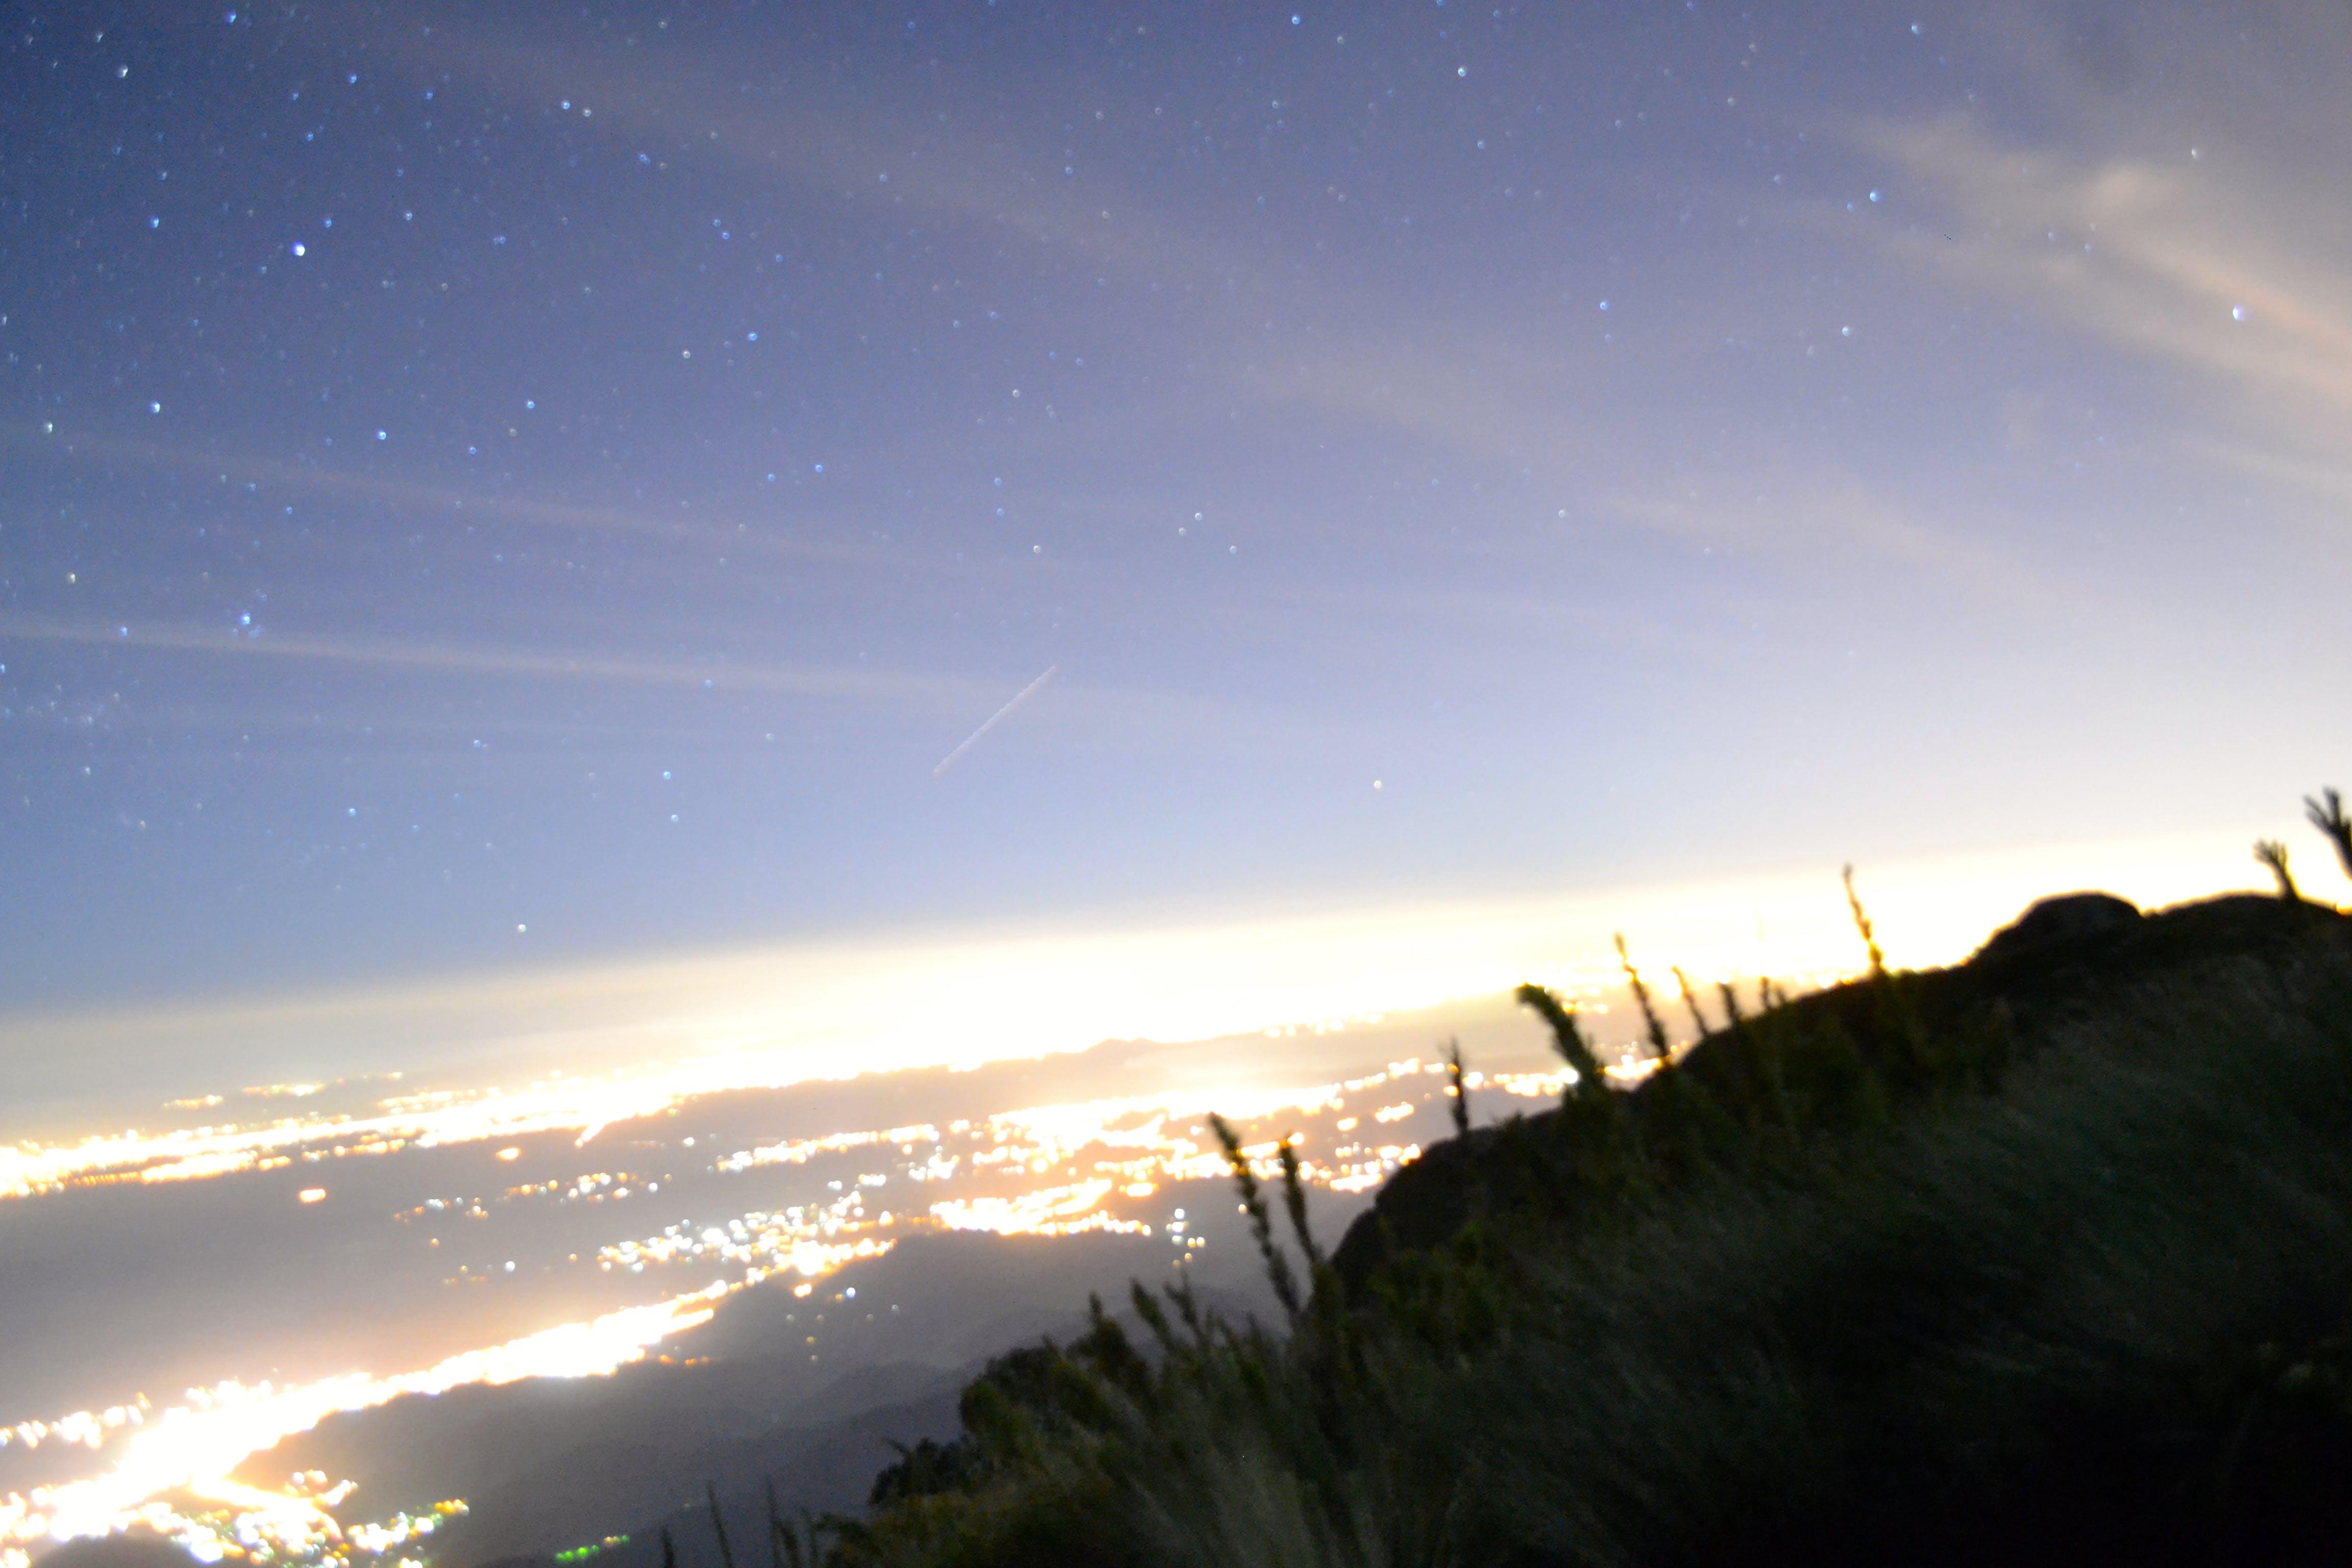 Free stock photo of city, sky, stars